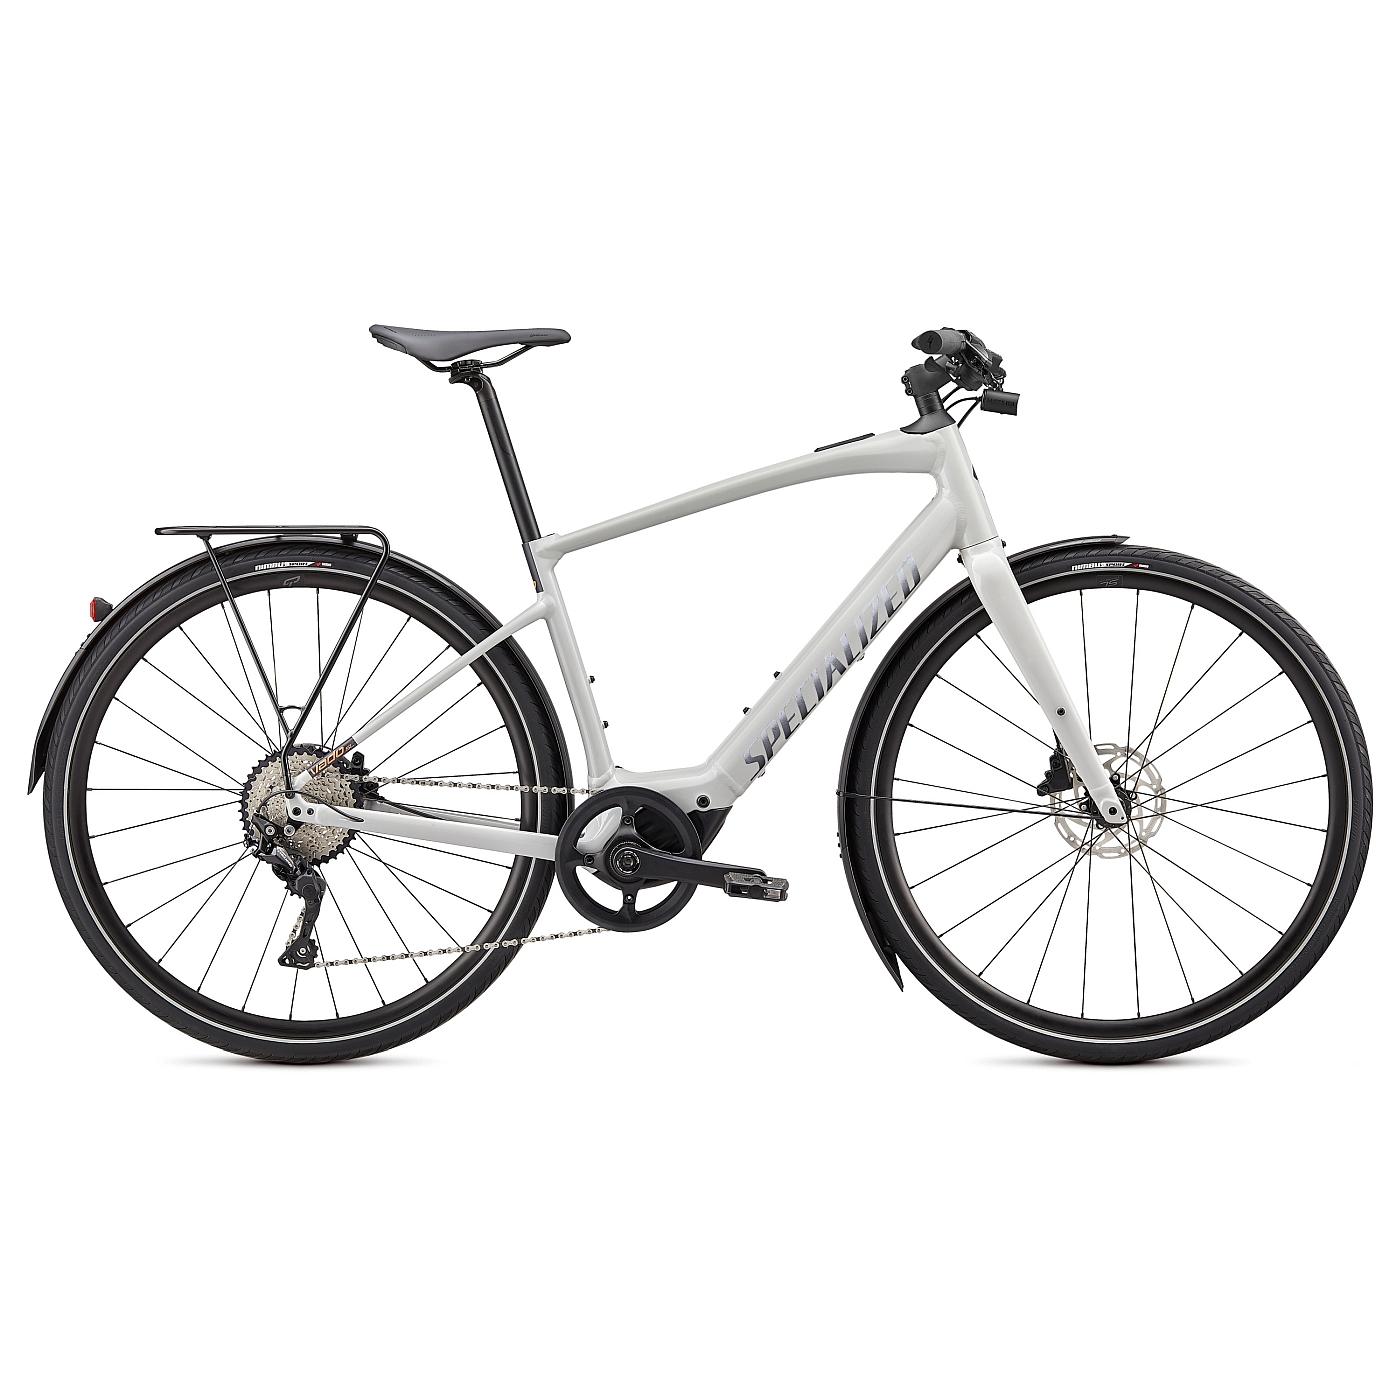 Produktbild von Specialized TURBO VADO SL 4.0 EQ E-Bike - 2021 - dove grey/acid lava/cast black